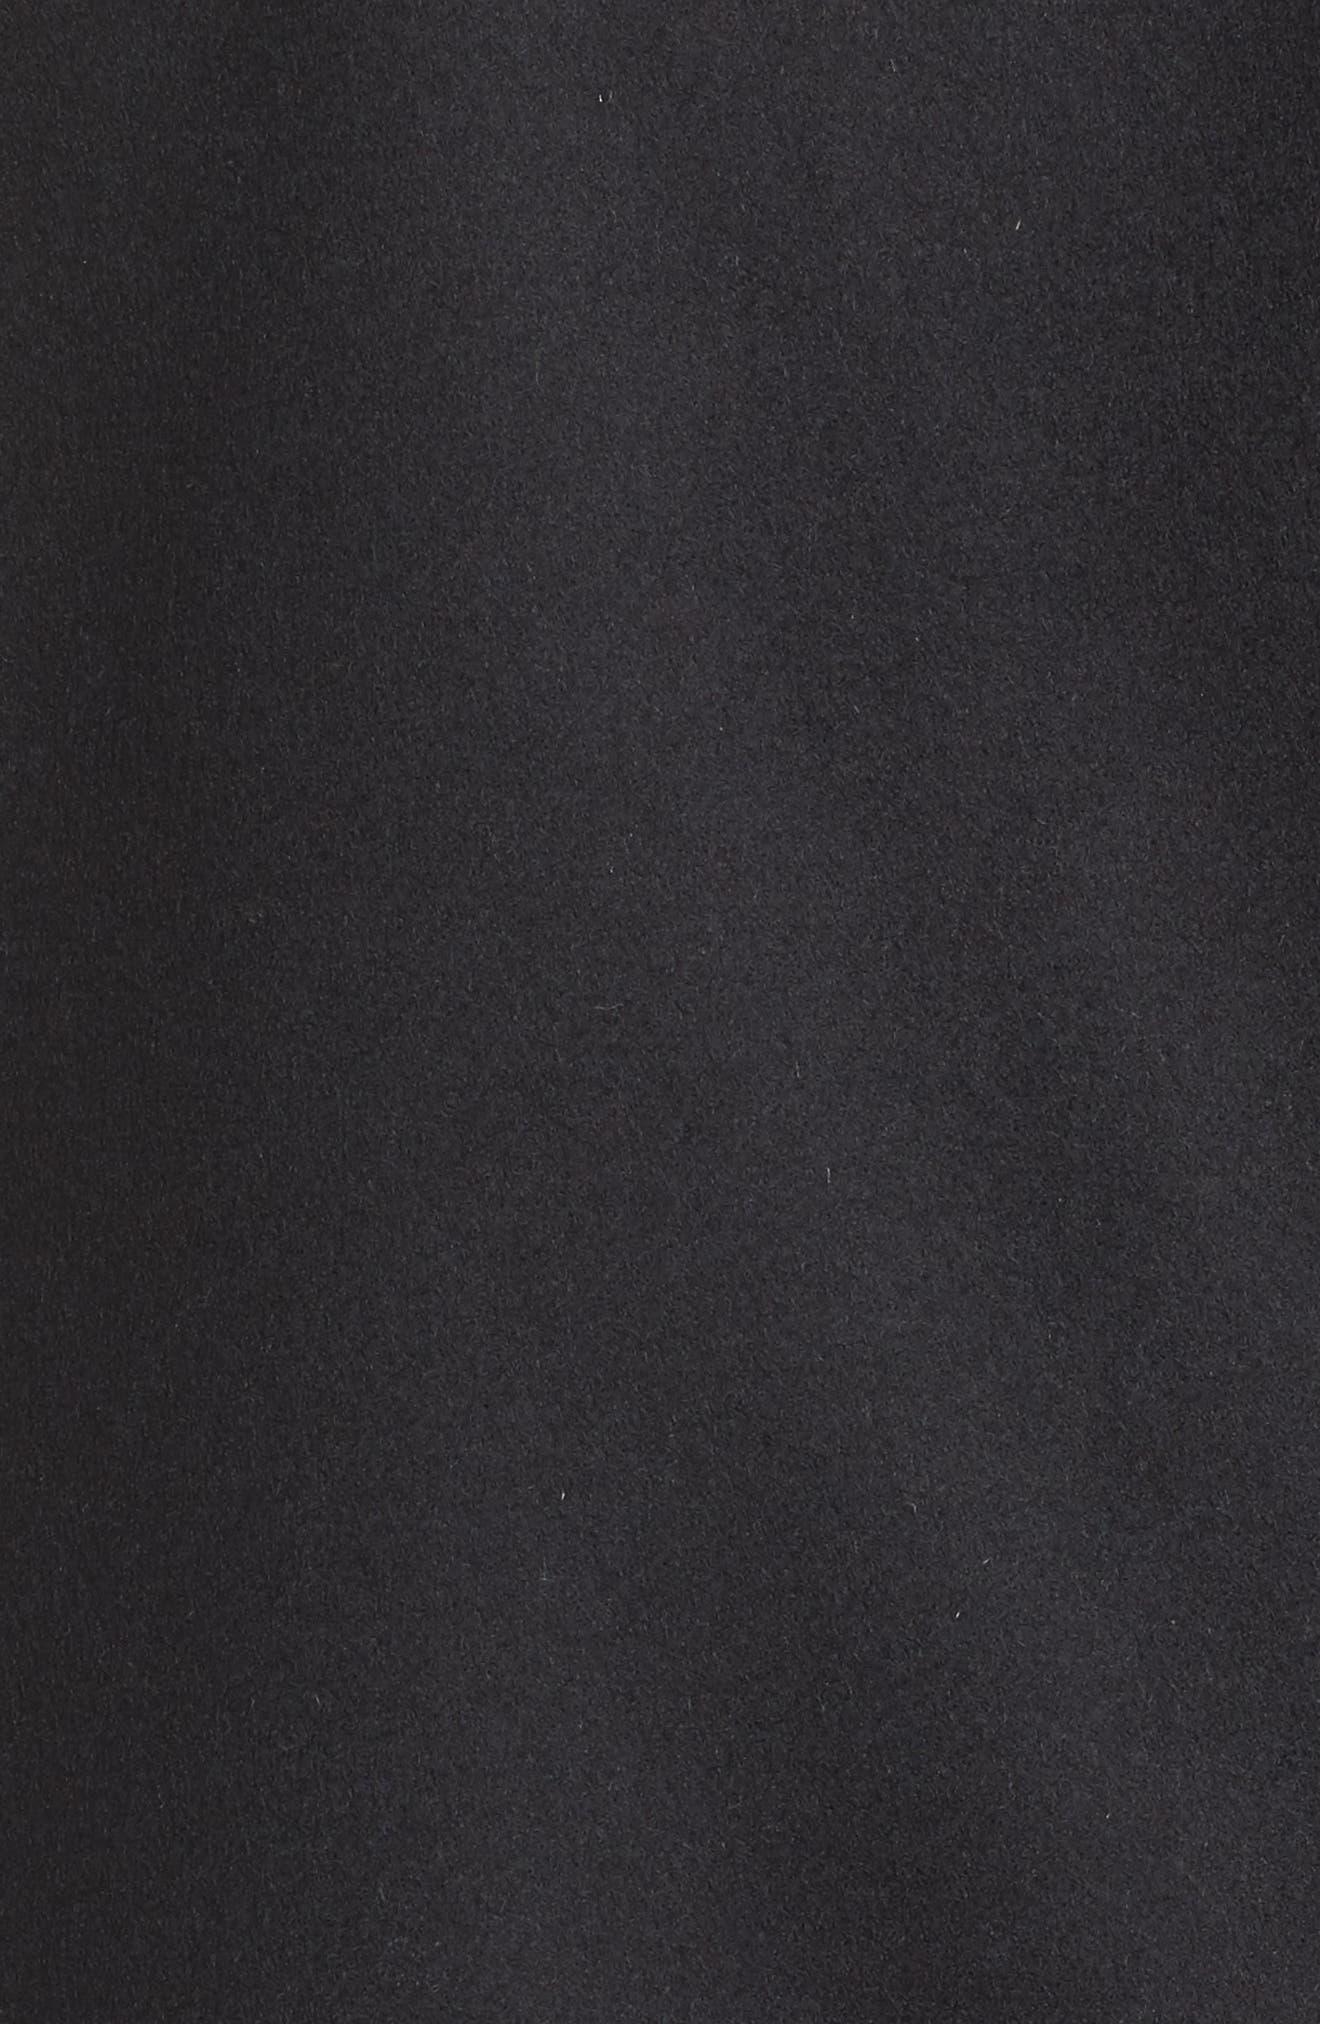 Wool Blend Moto Jacket,                             Alternate thumbnail 6, color,                             001